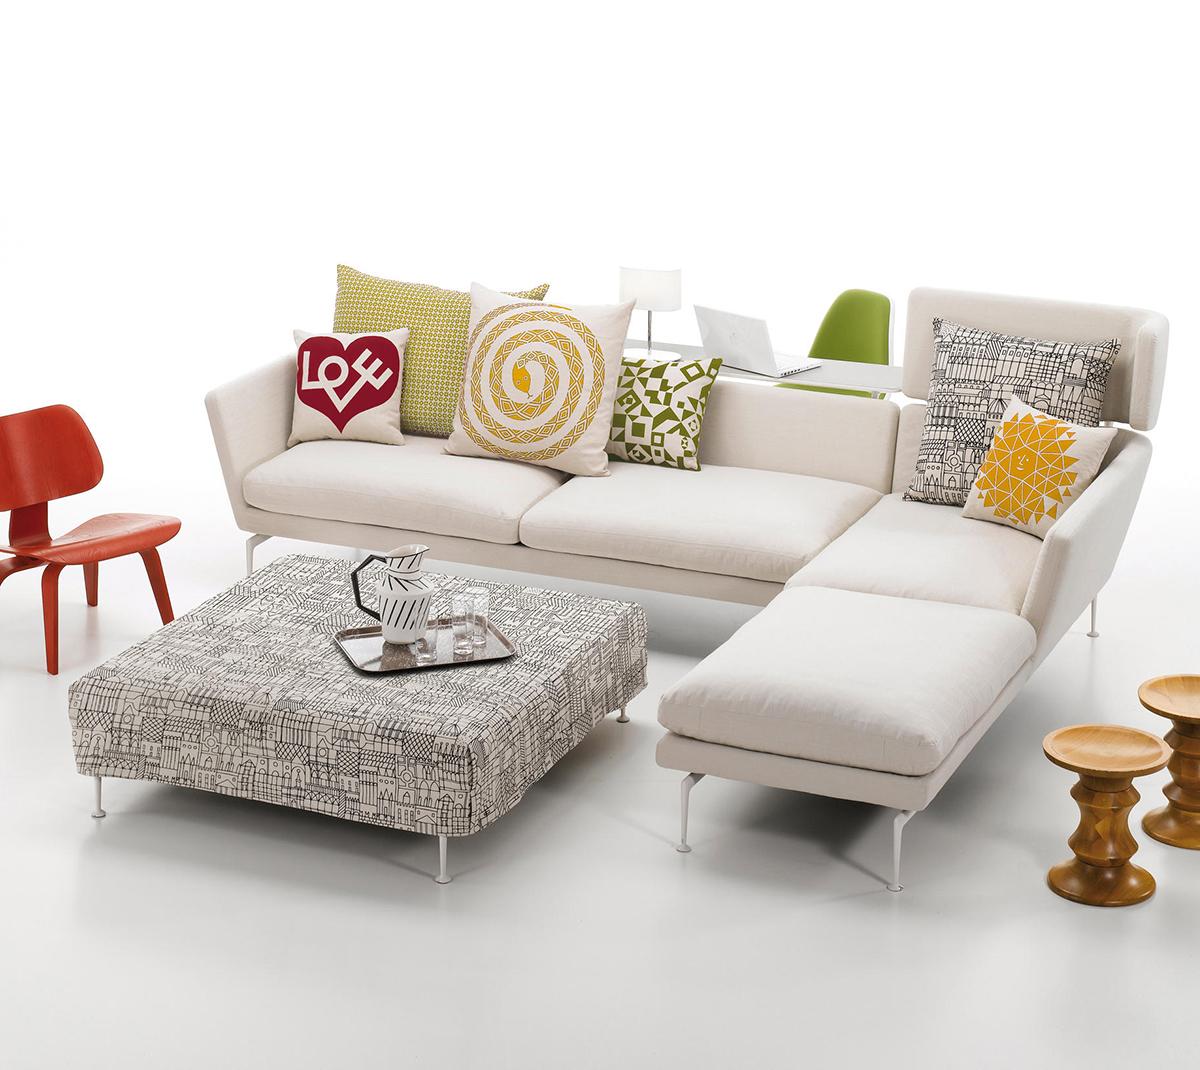 Canapé Moelleux Assise Profonde habitat / fauteuils / canapés / maralunga - design